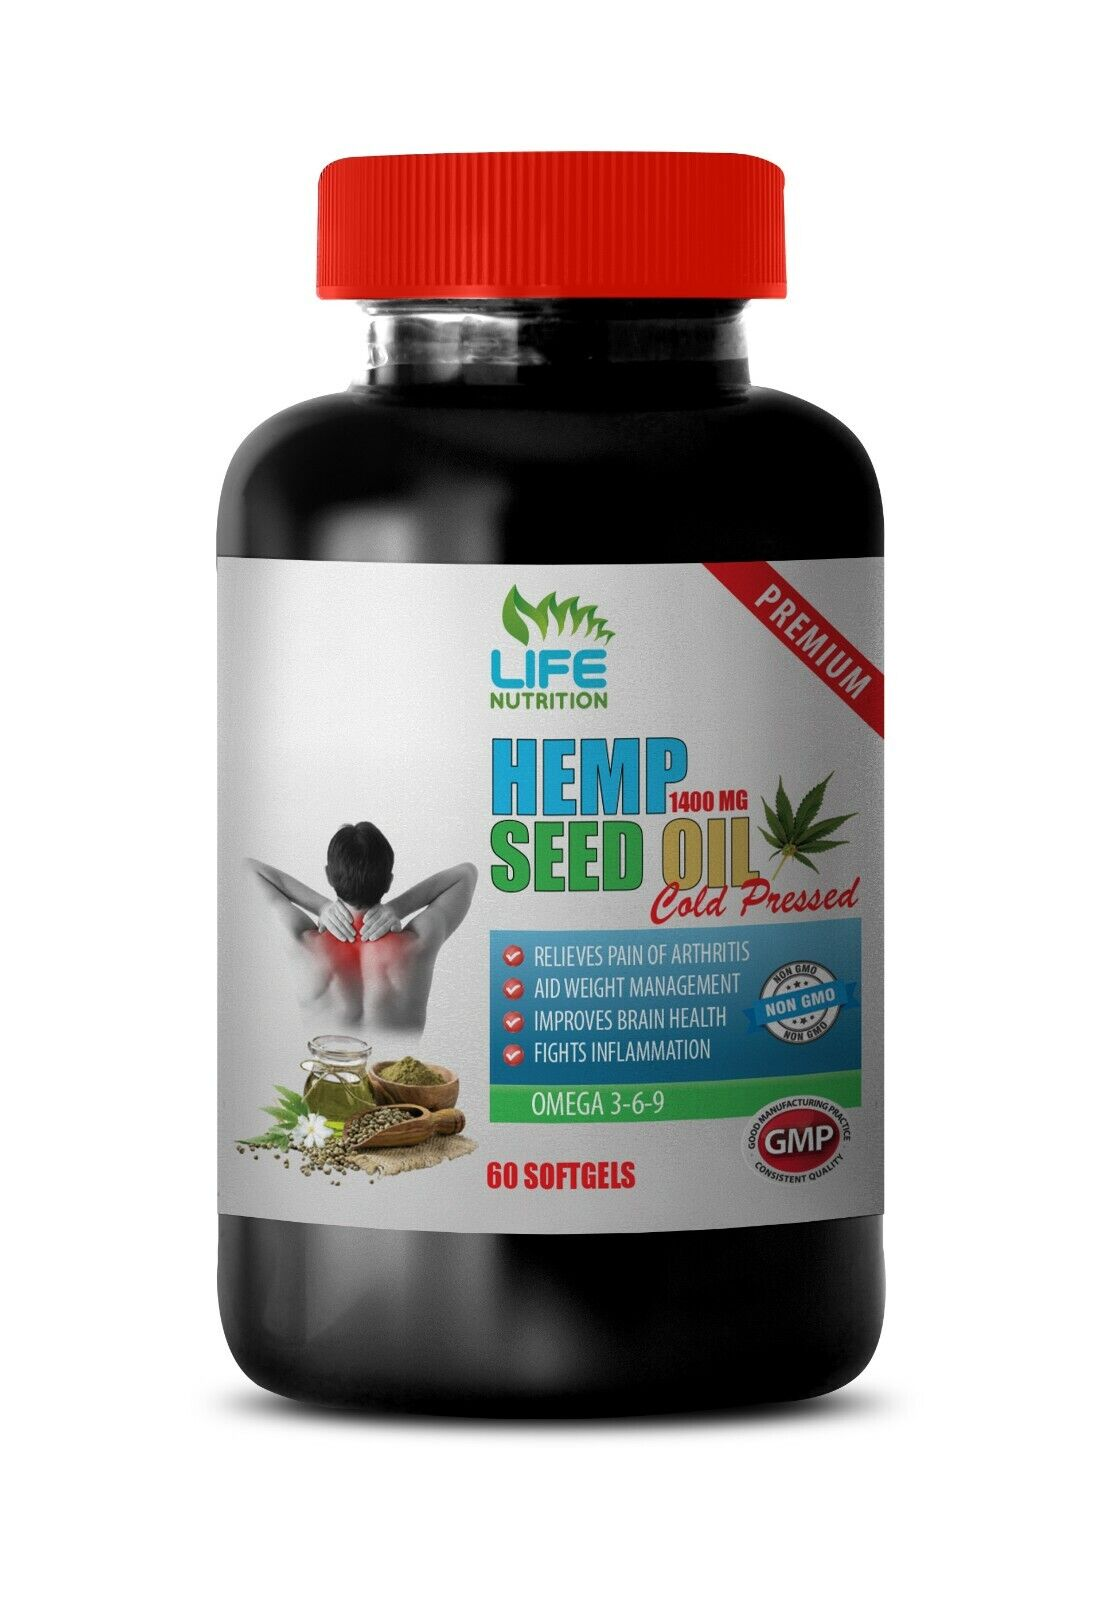 omega fatty acids, ORGANIC HEMP SEED OIL 1400mg, alpha linoleic acid 1B